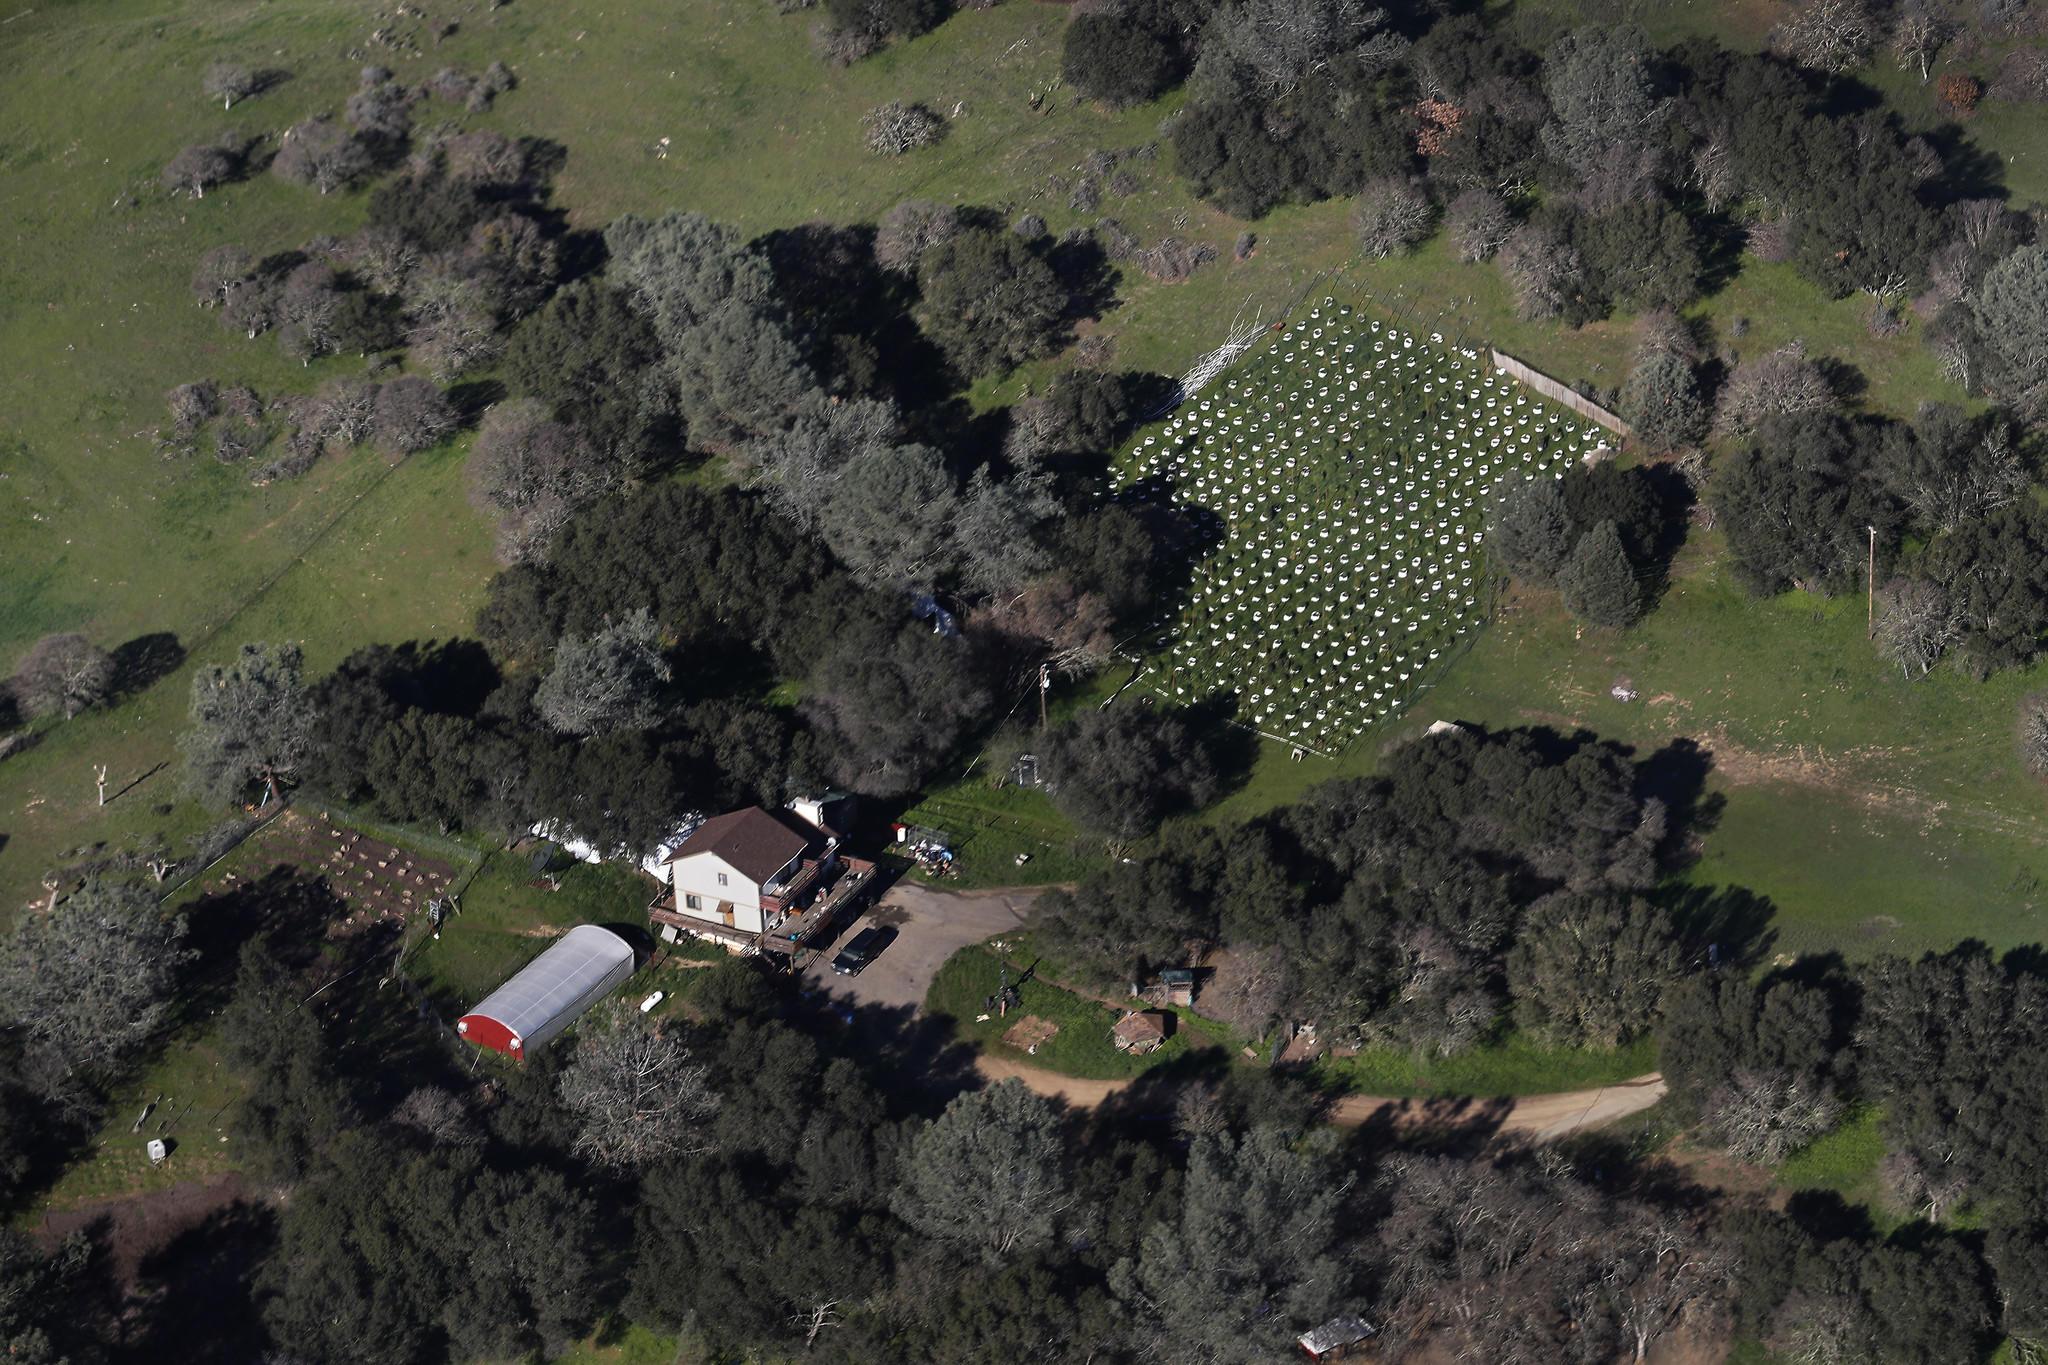 A rural county legalized marijuana farms  It took their tax money